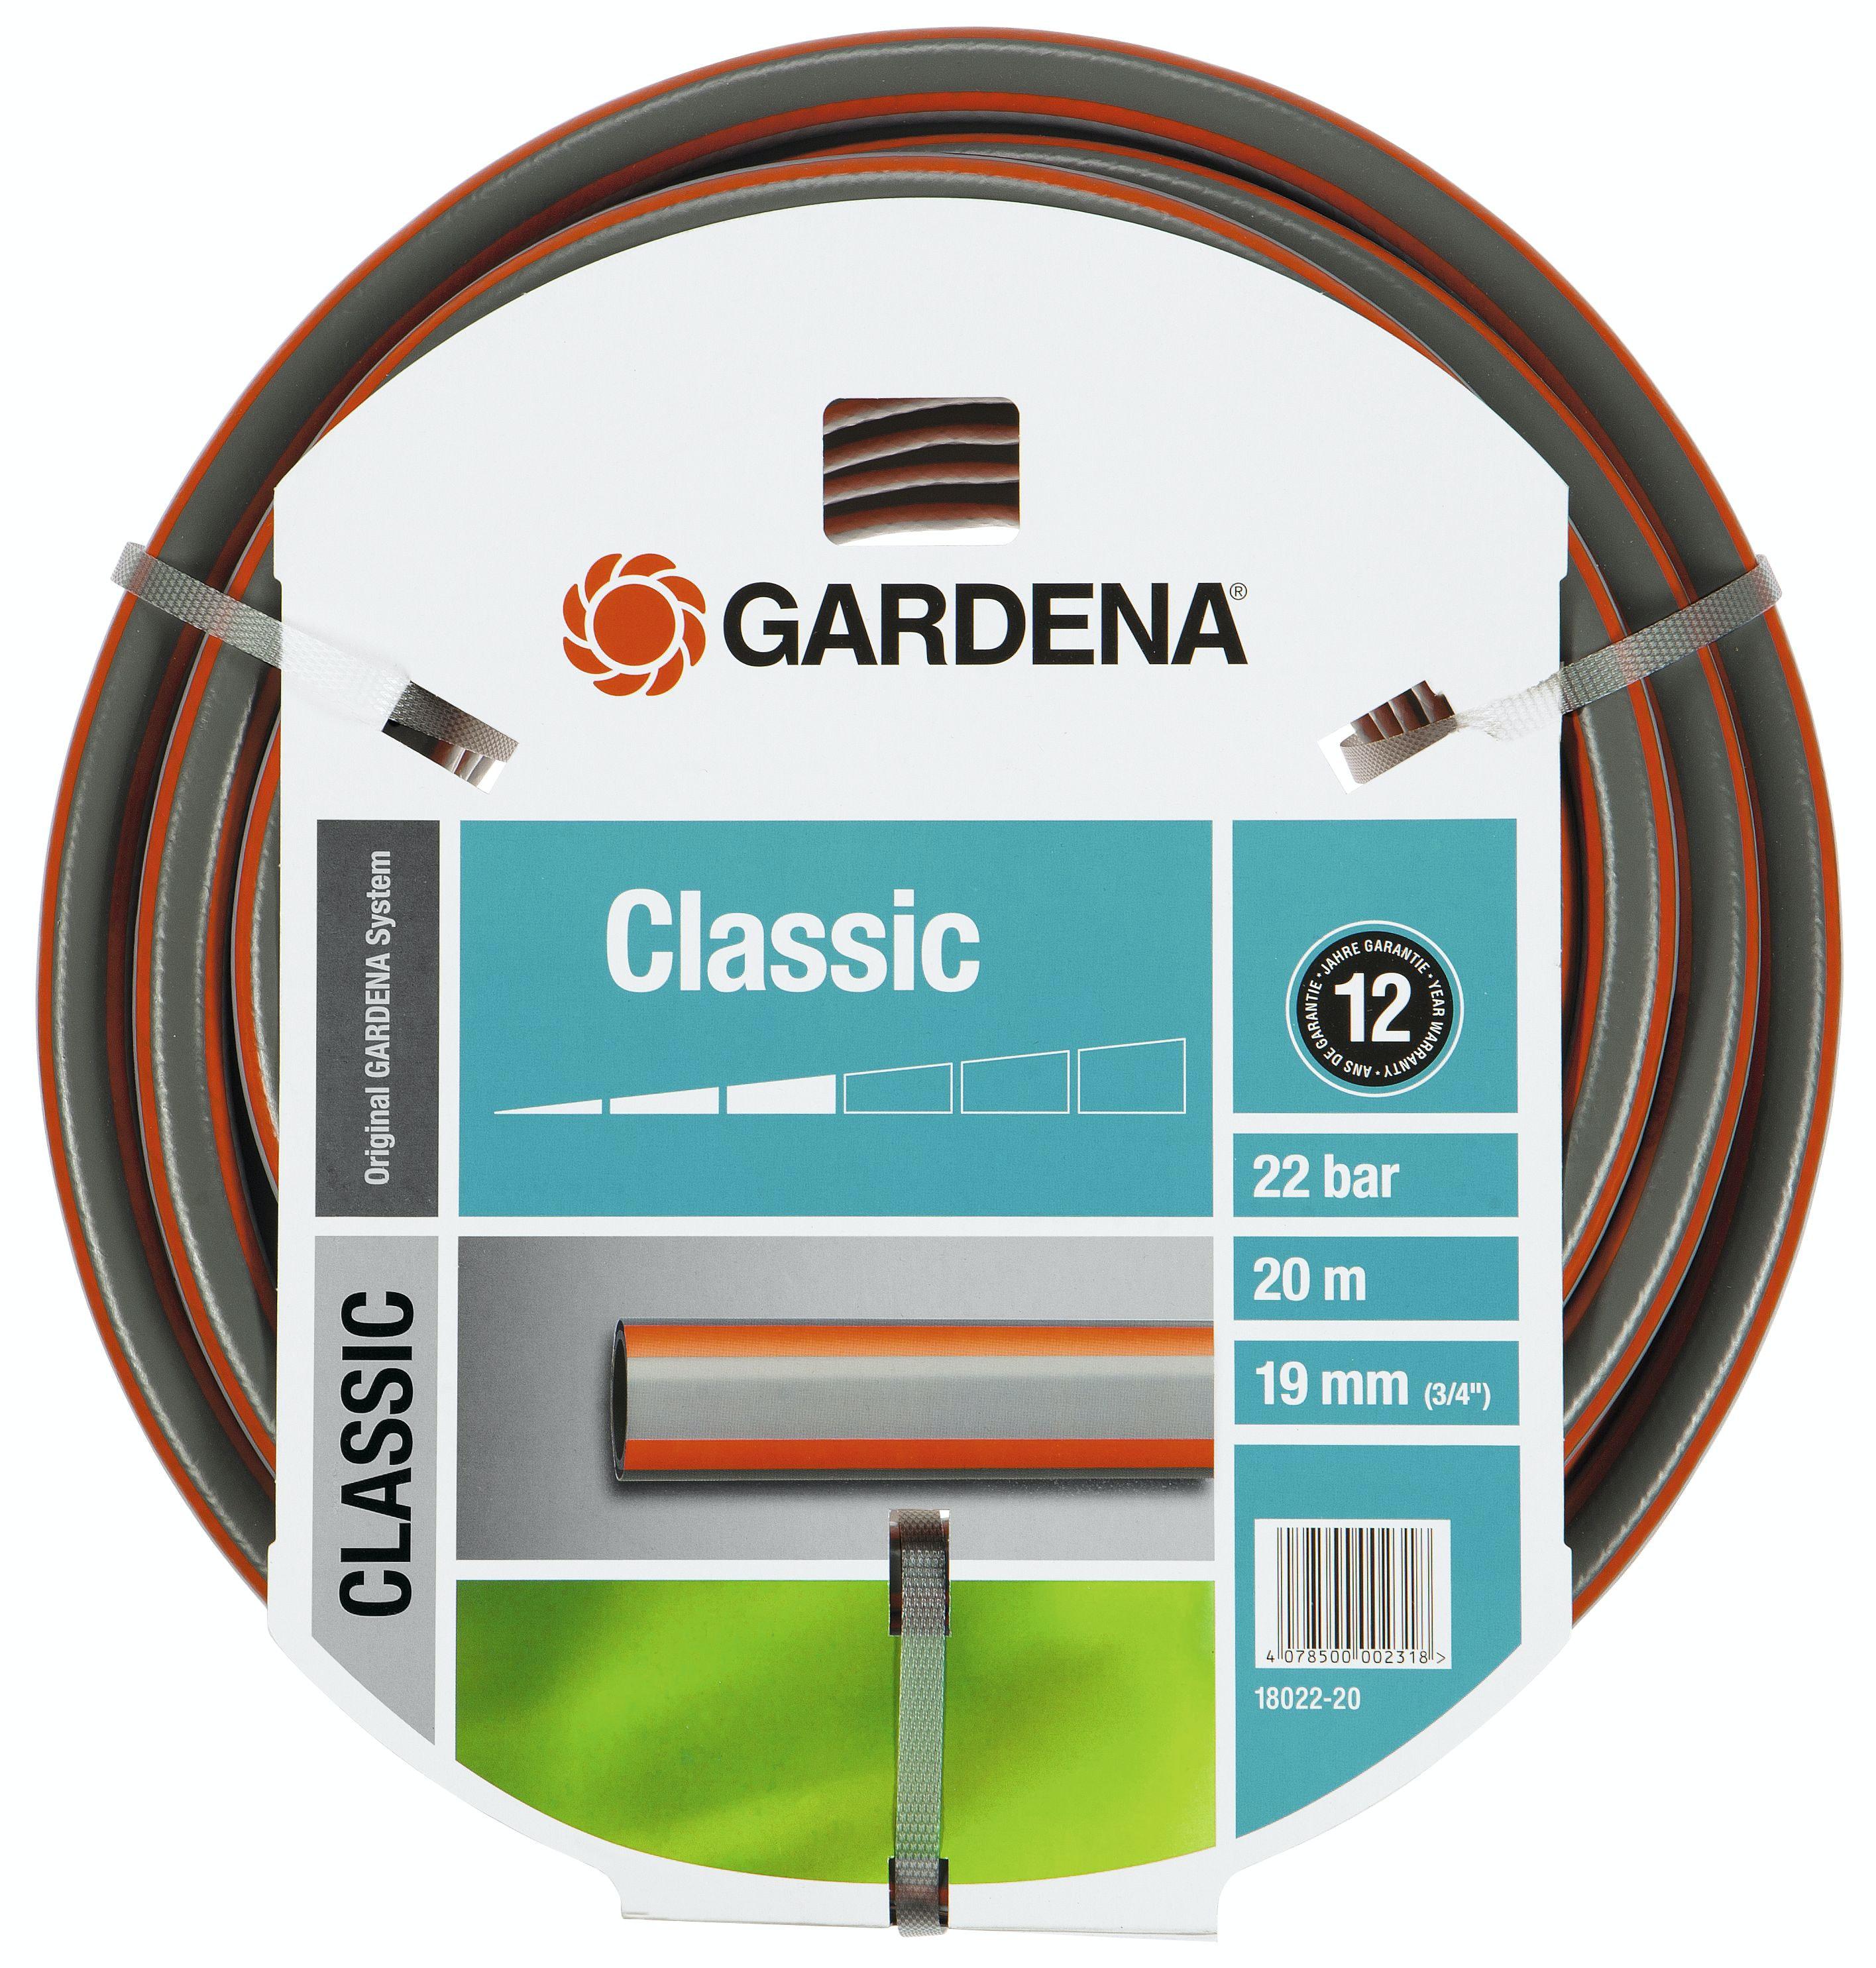 Slang Gardena Classic (3/4In) 20m W/O